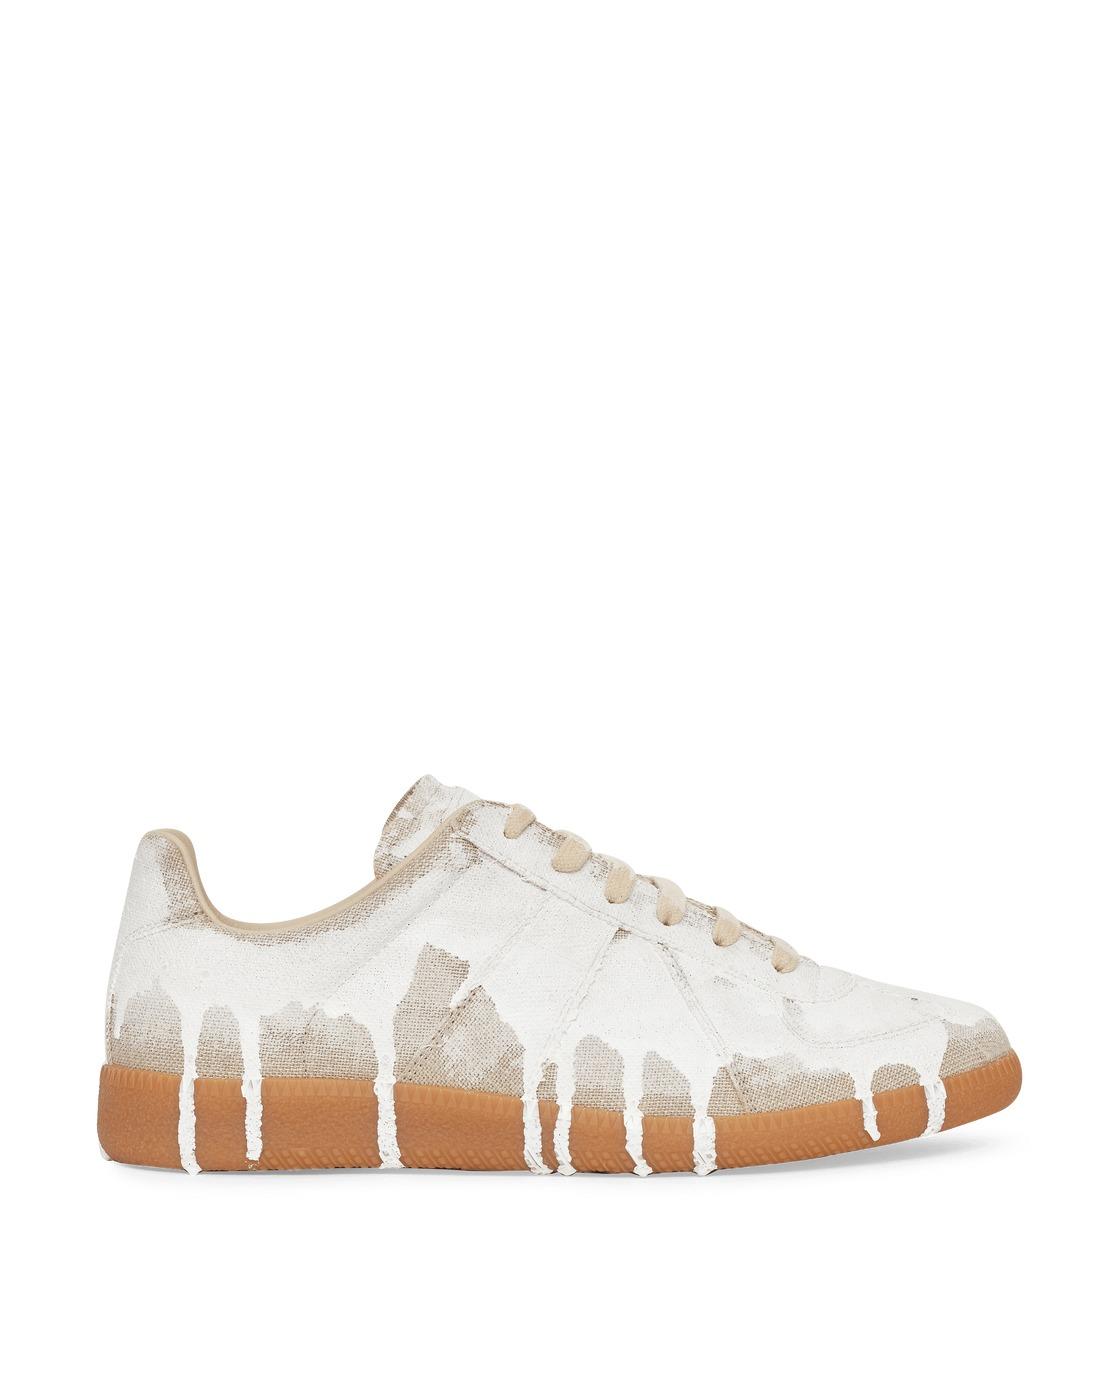 Photo: Maison Margiela Replica Bianchetto Sneakers Natural/White Mat